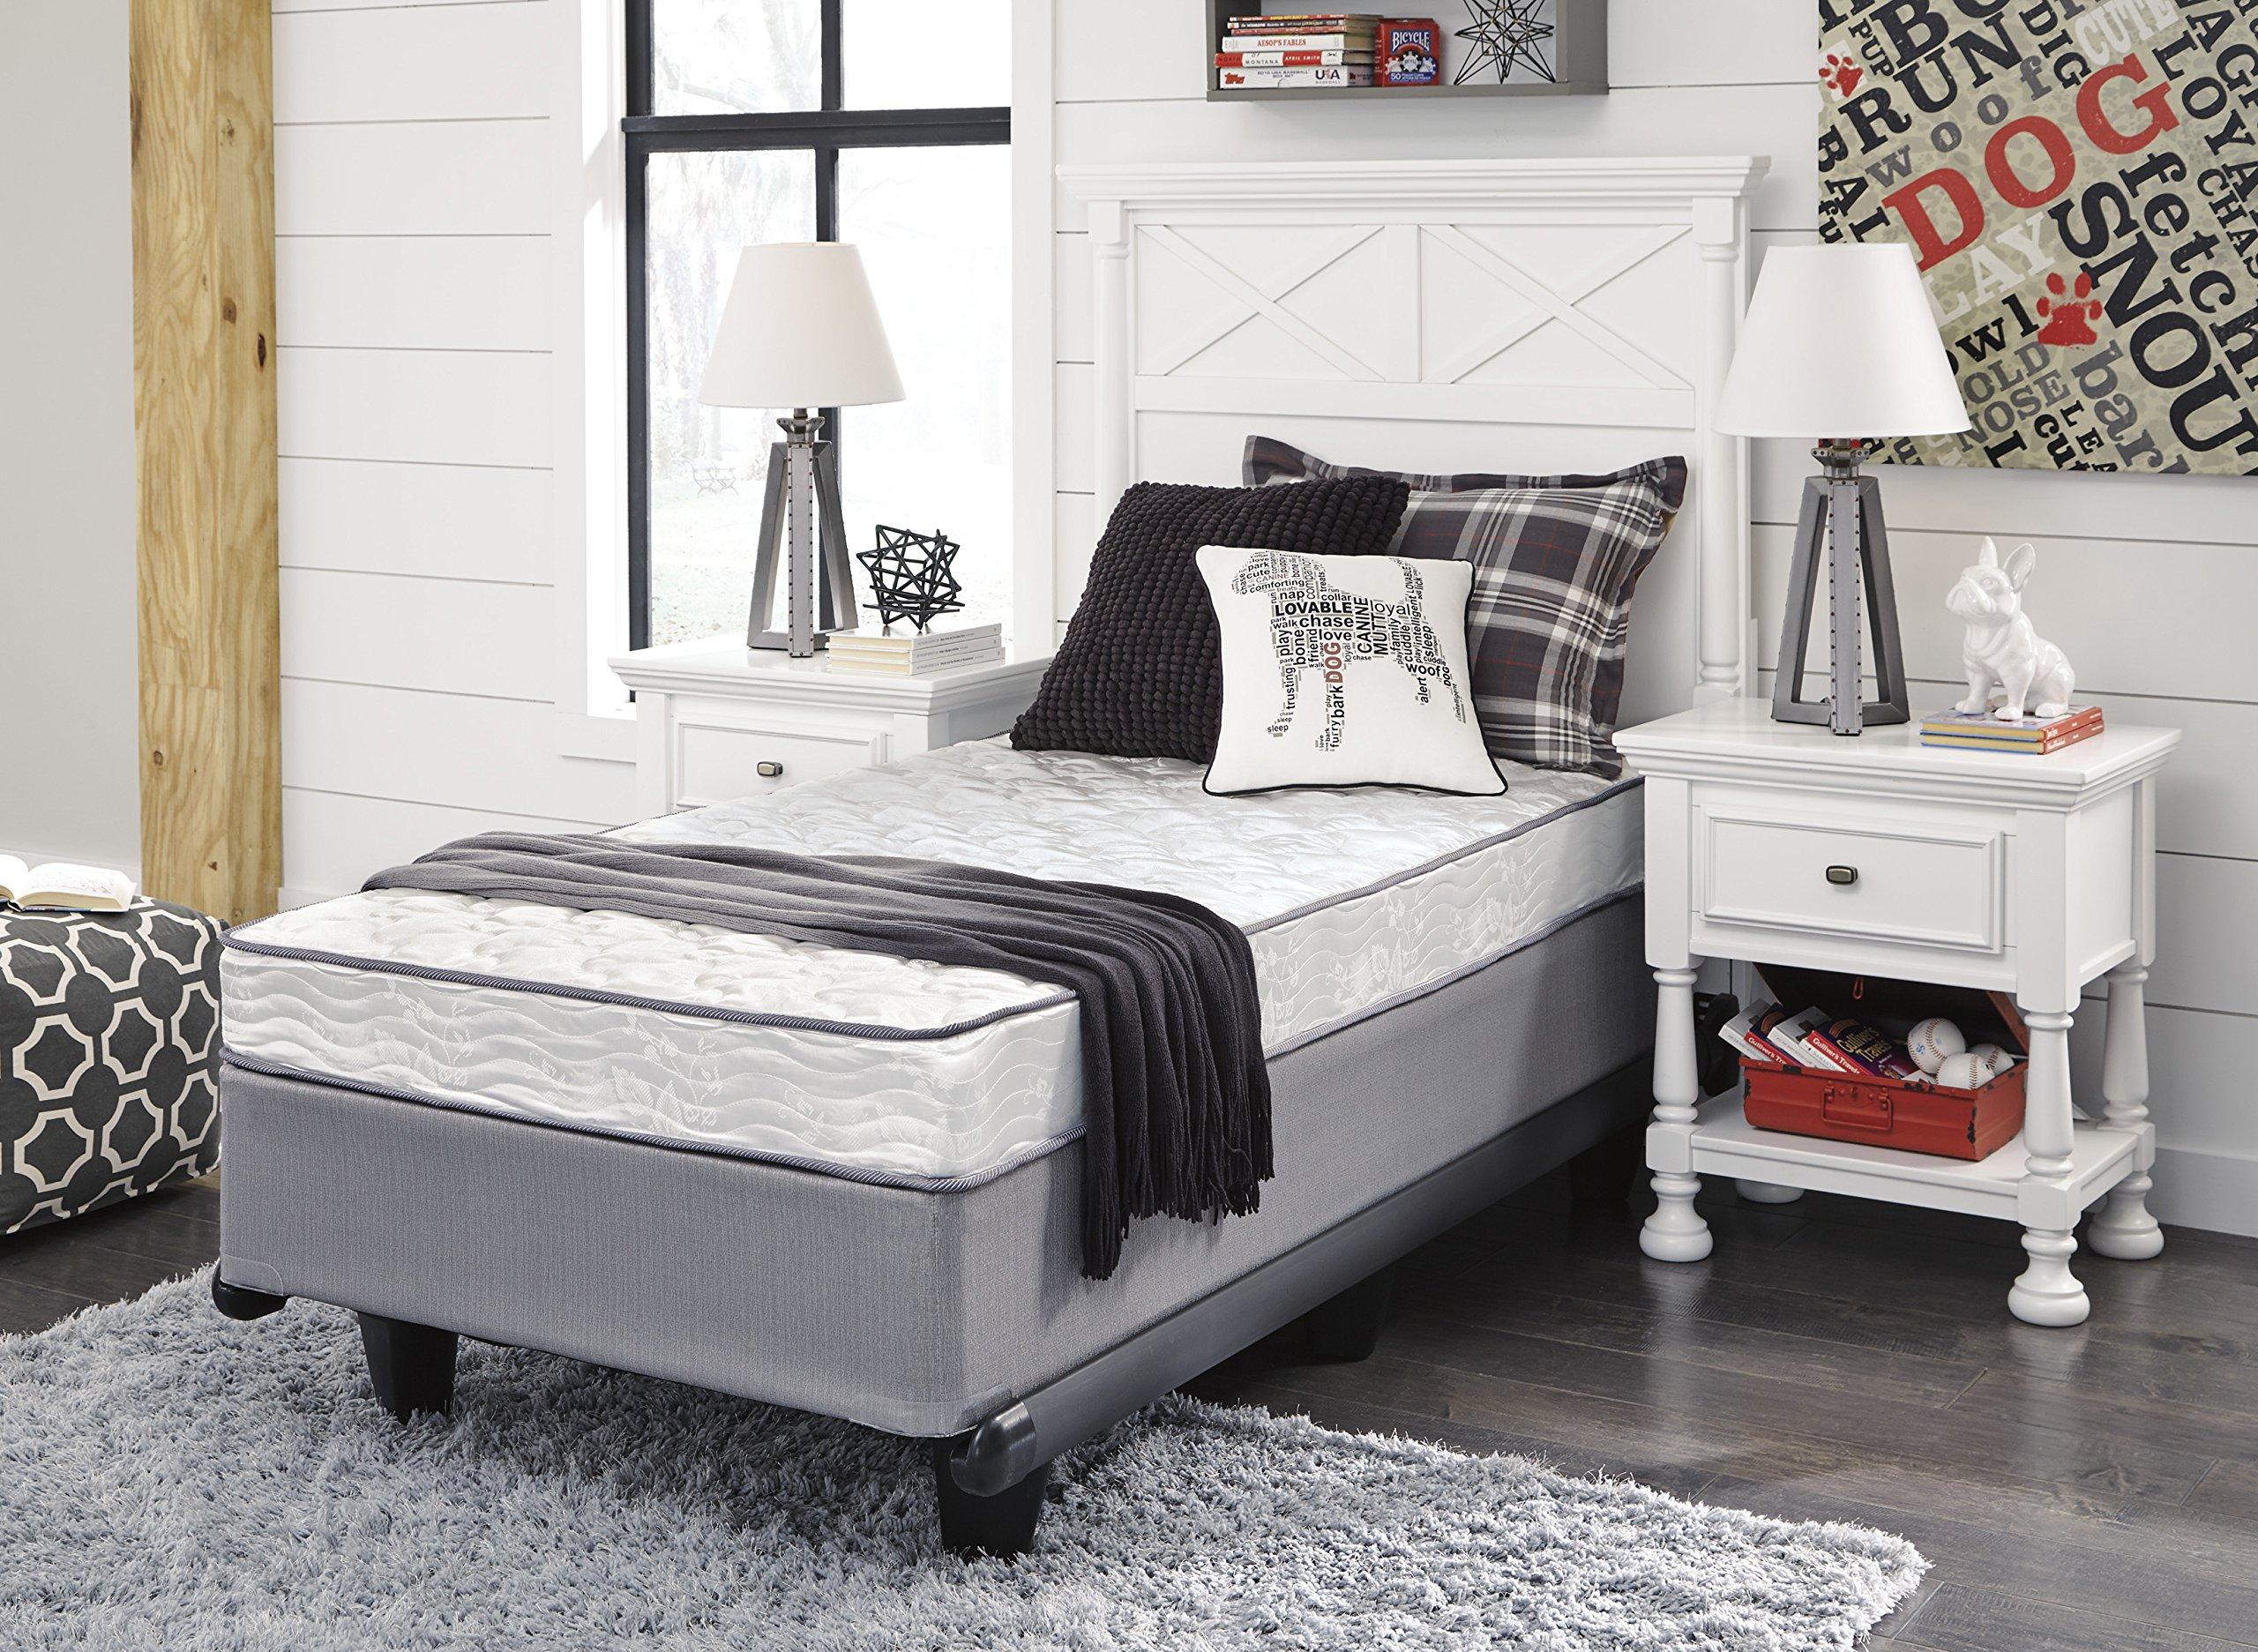 shley Furniture Signature Design - Sierra Sleep - Bonell Twin Size Mattress - 6 inches -White